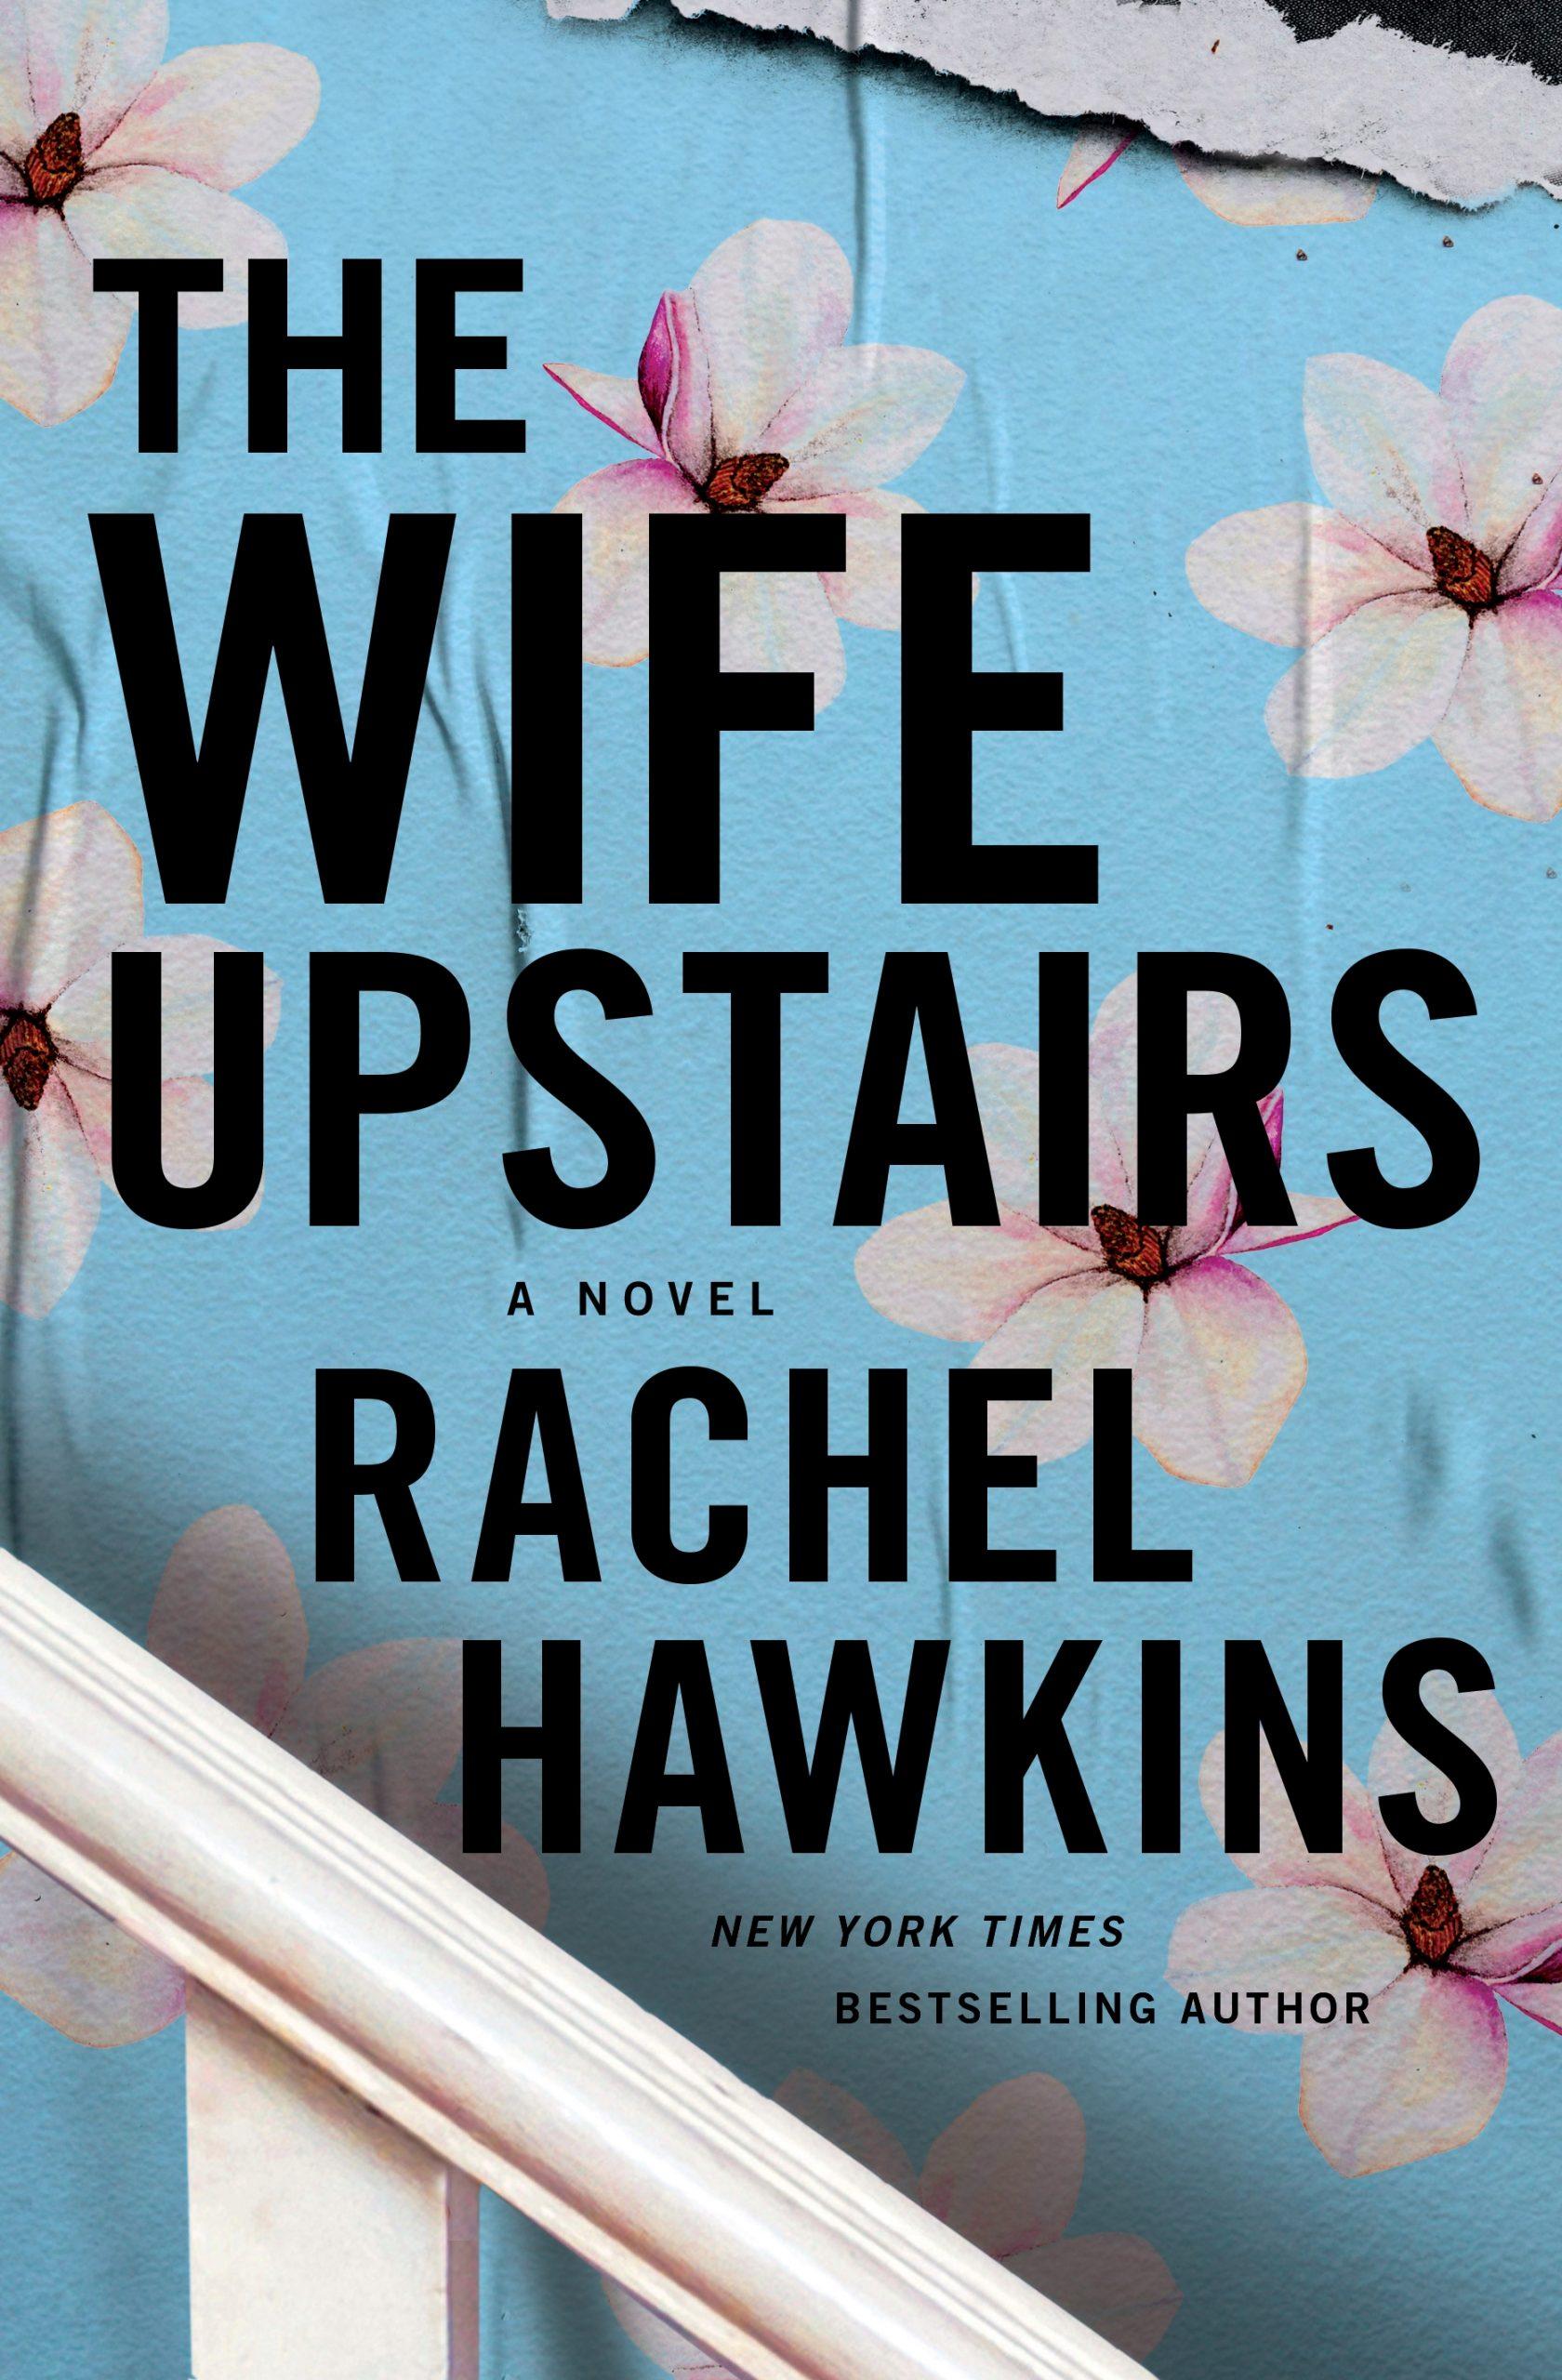 Hawkins_TheWifeUpstairs-1